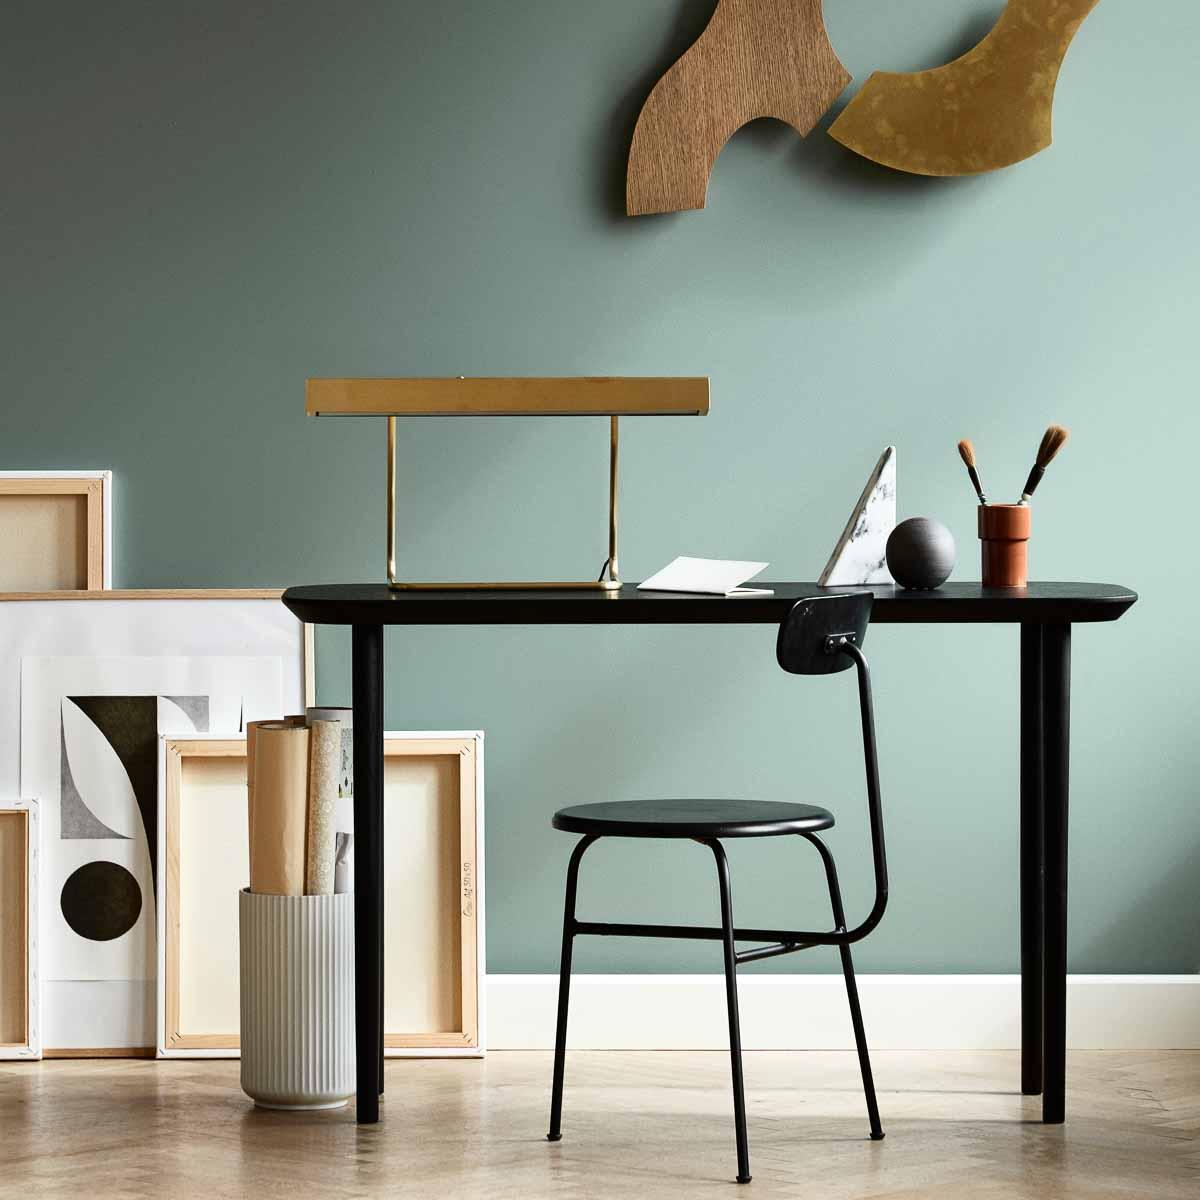 Coffee Table von Lindebjerg Design